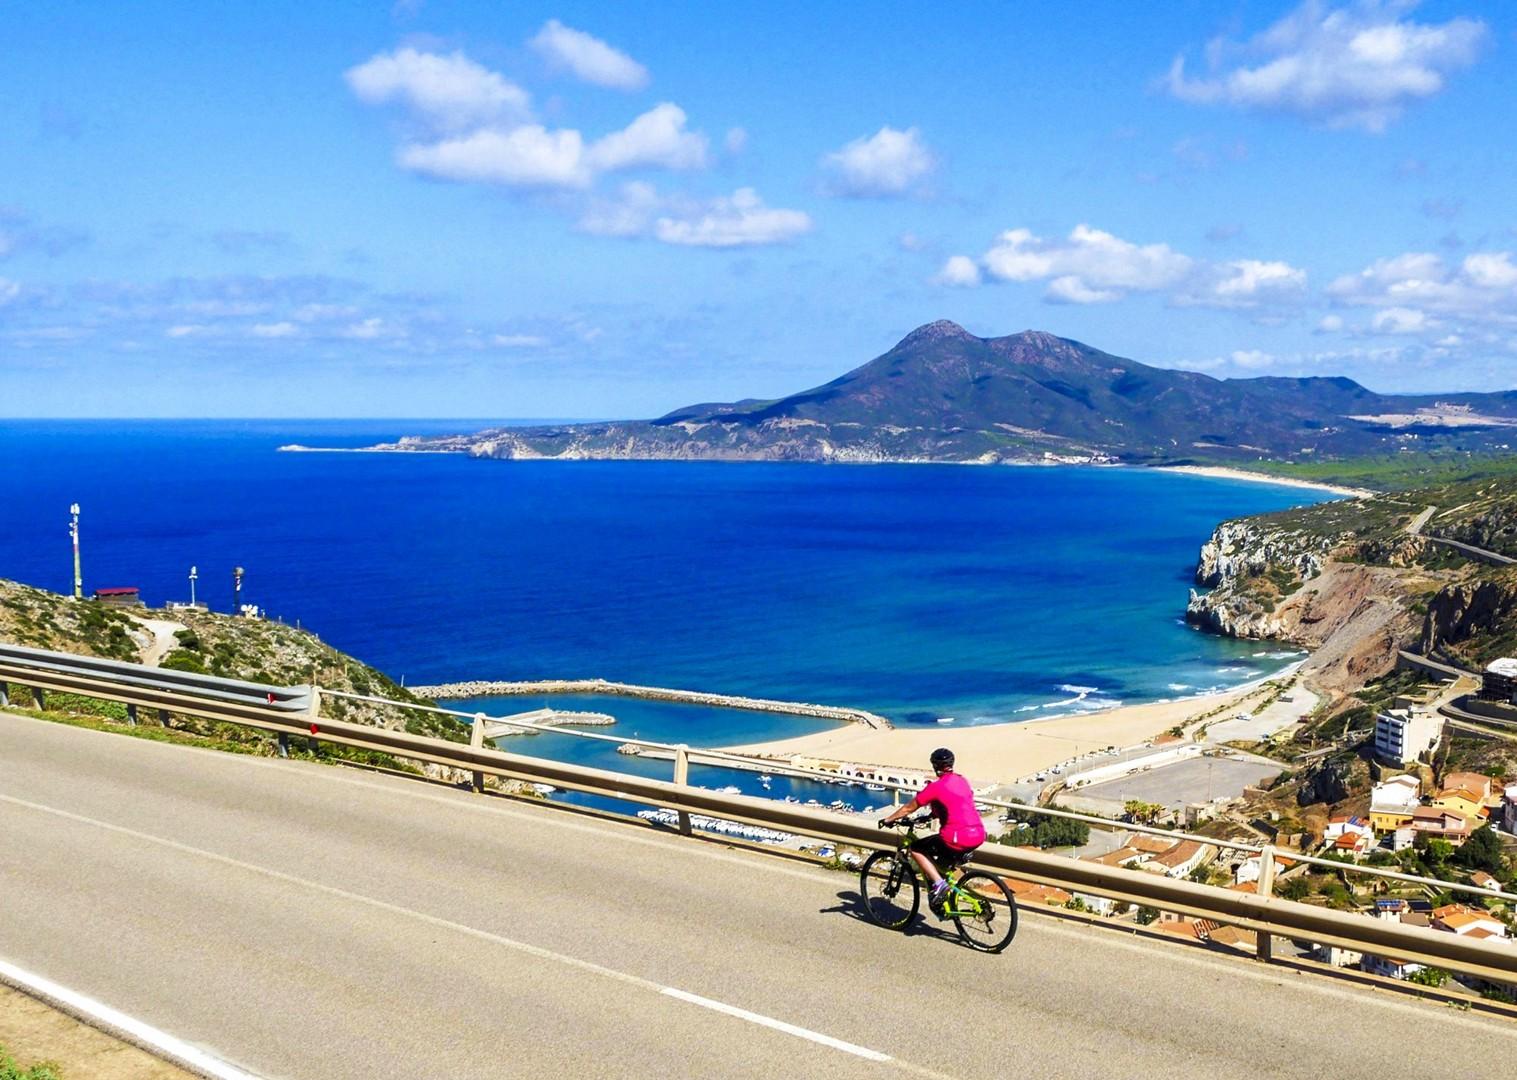 _Holiday.390.18767-2.jpg - Italy - Sardinia - Island Flavours - Guided Leisure Cycling Holiday - Leisure Cycling